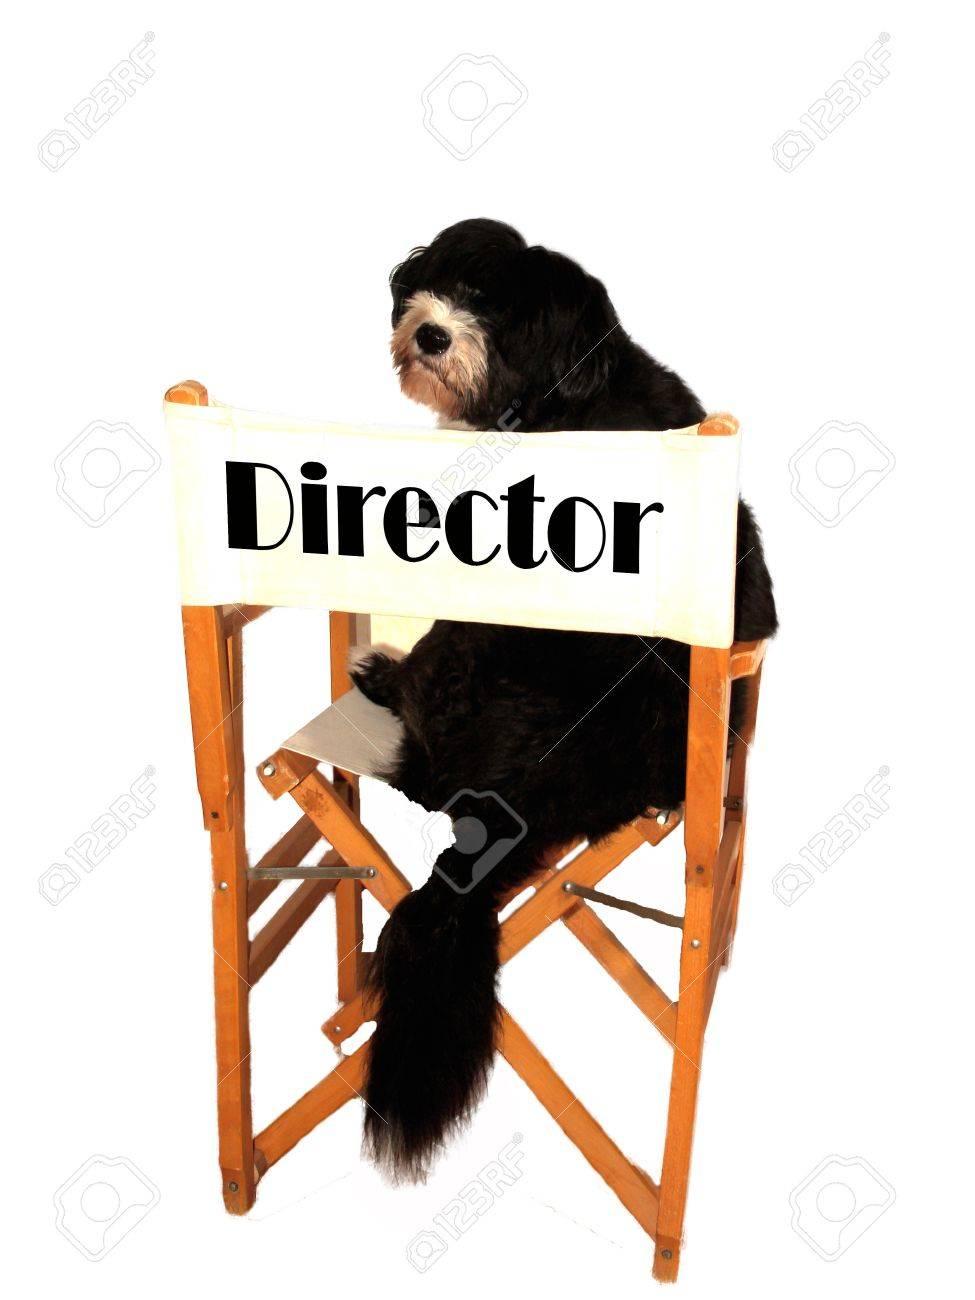 a black director filmaker funny dog Stock Photo - 16448870